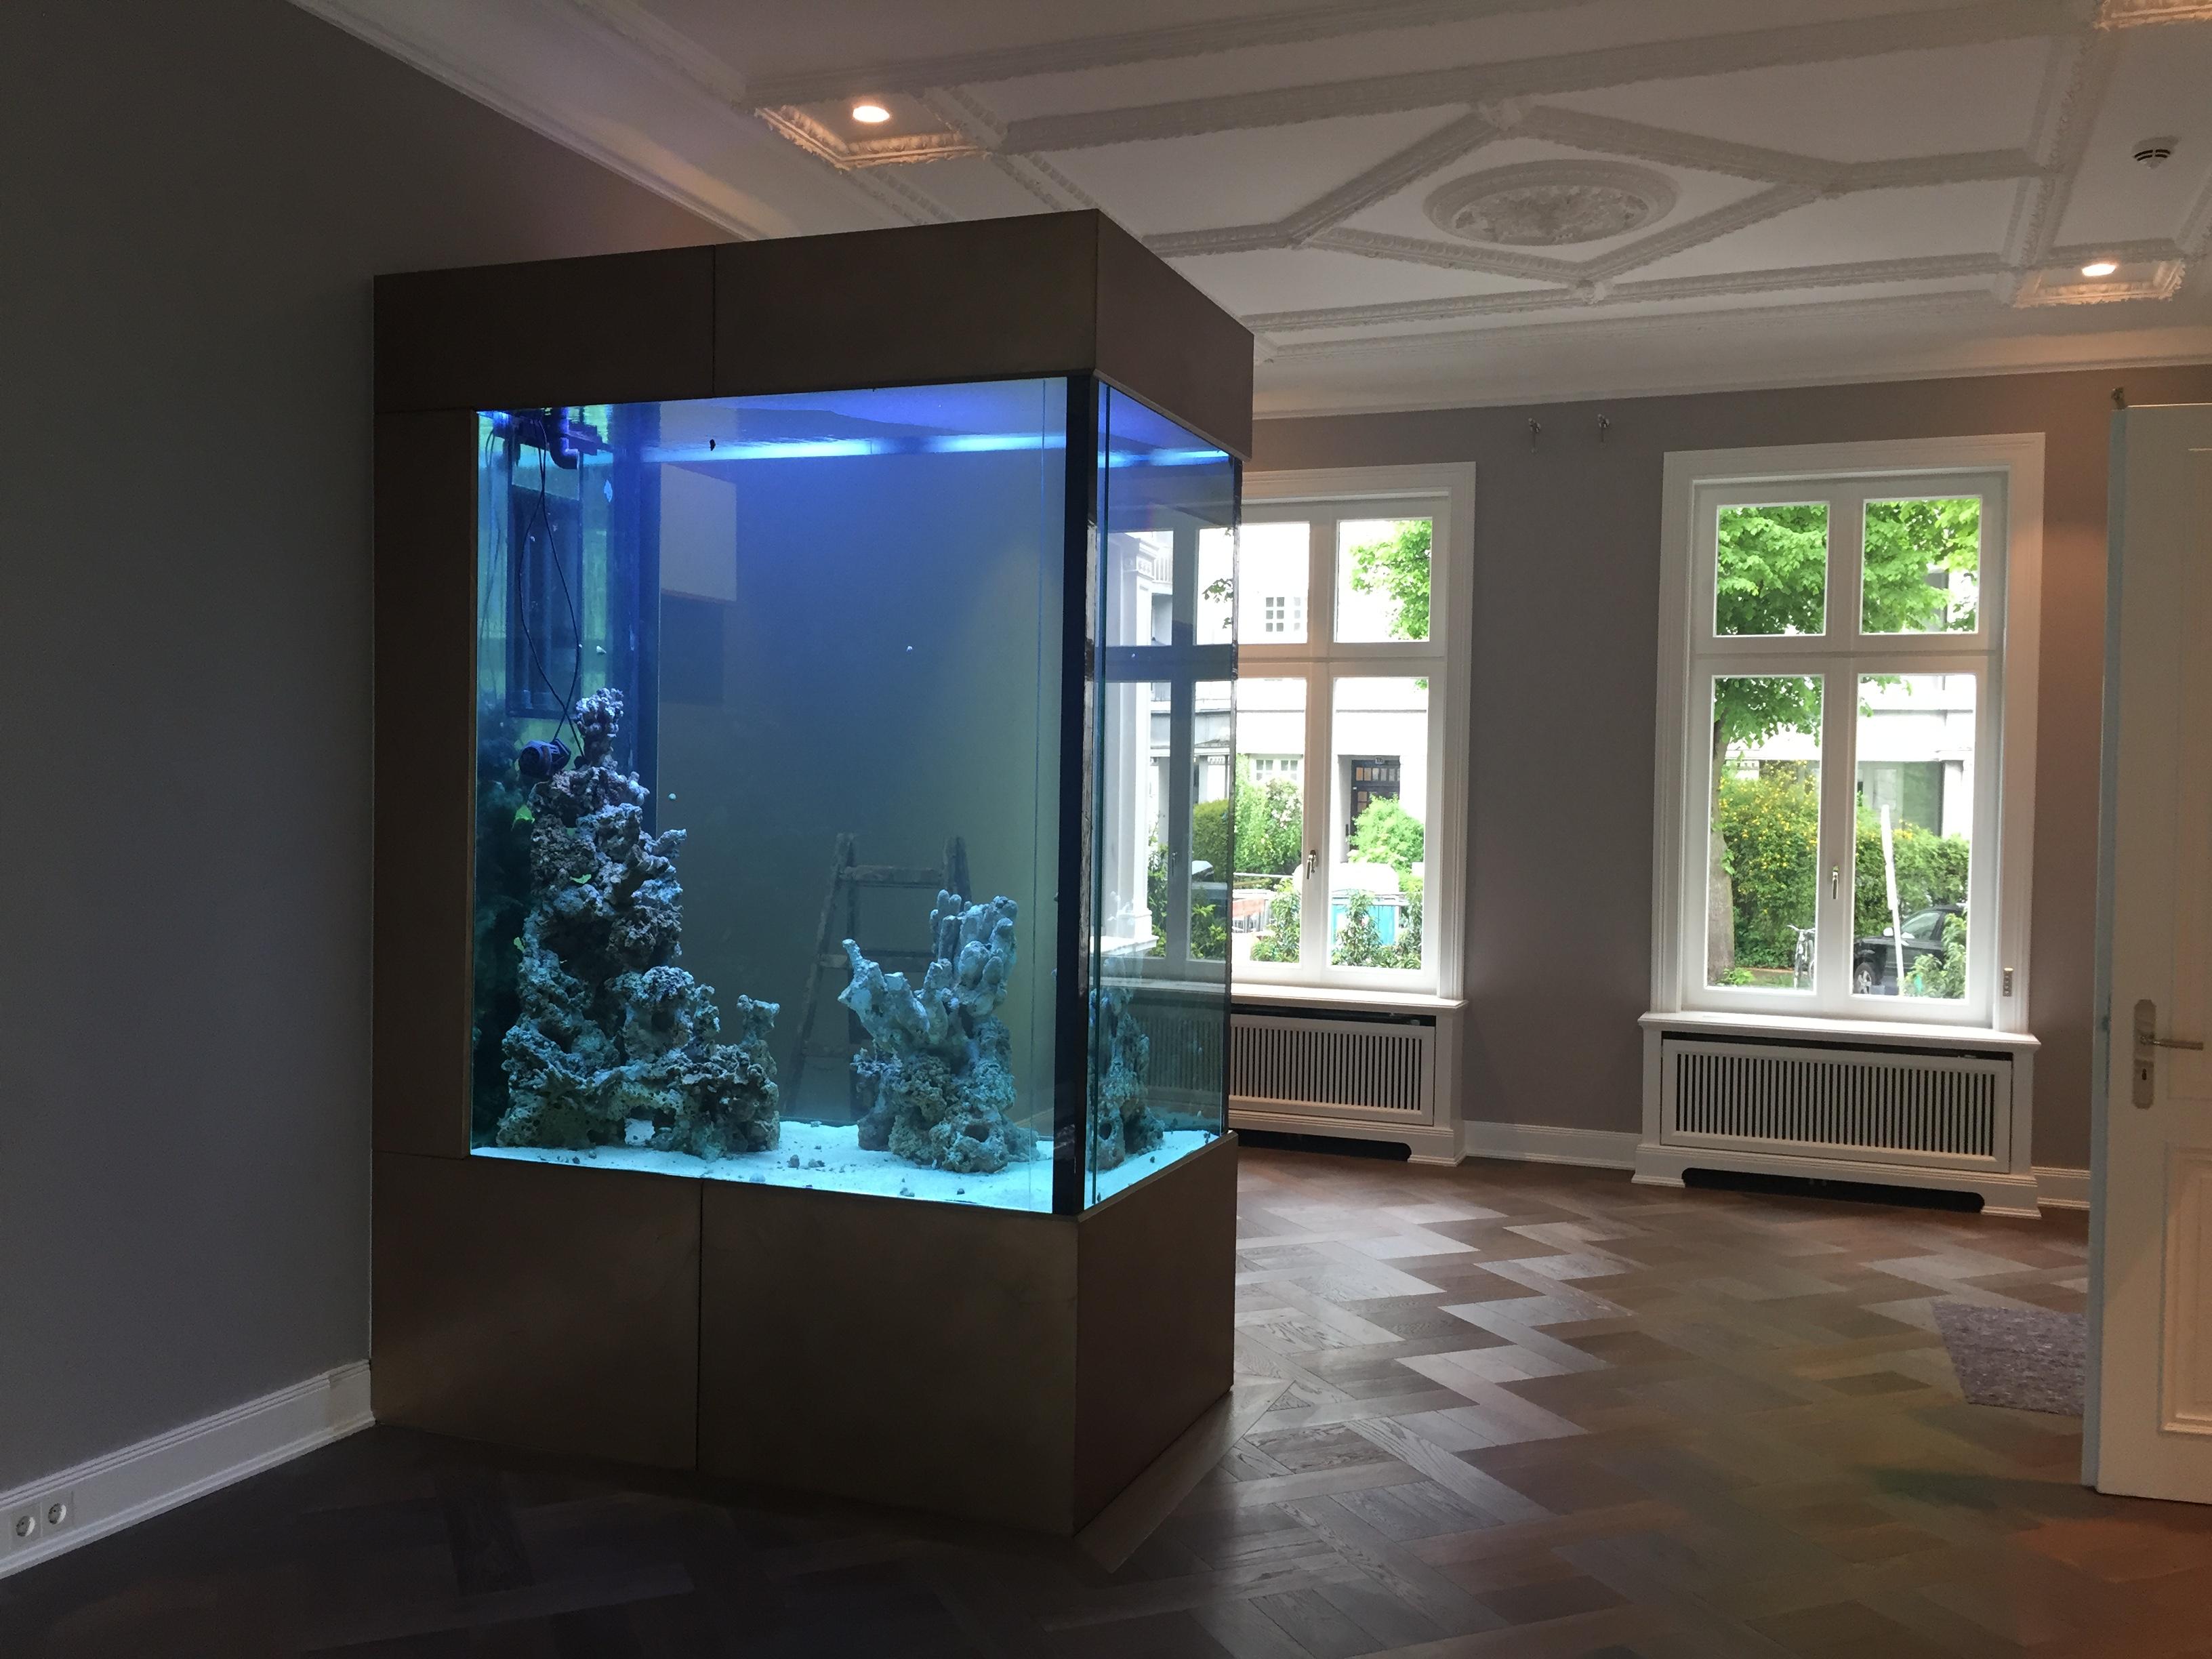 Das 2m hohe Aquarium